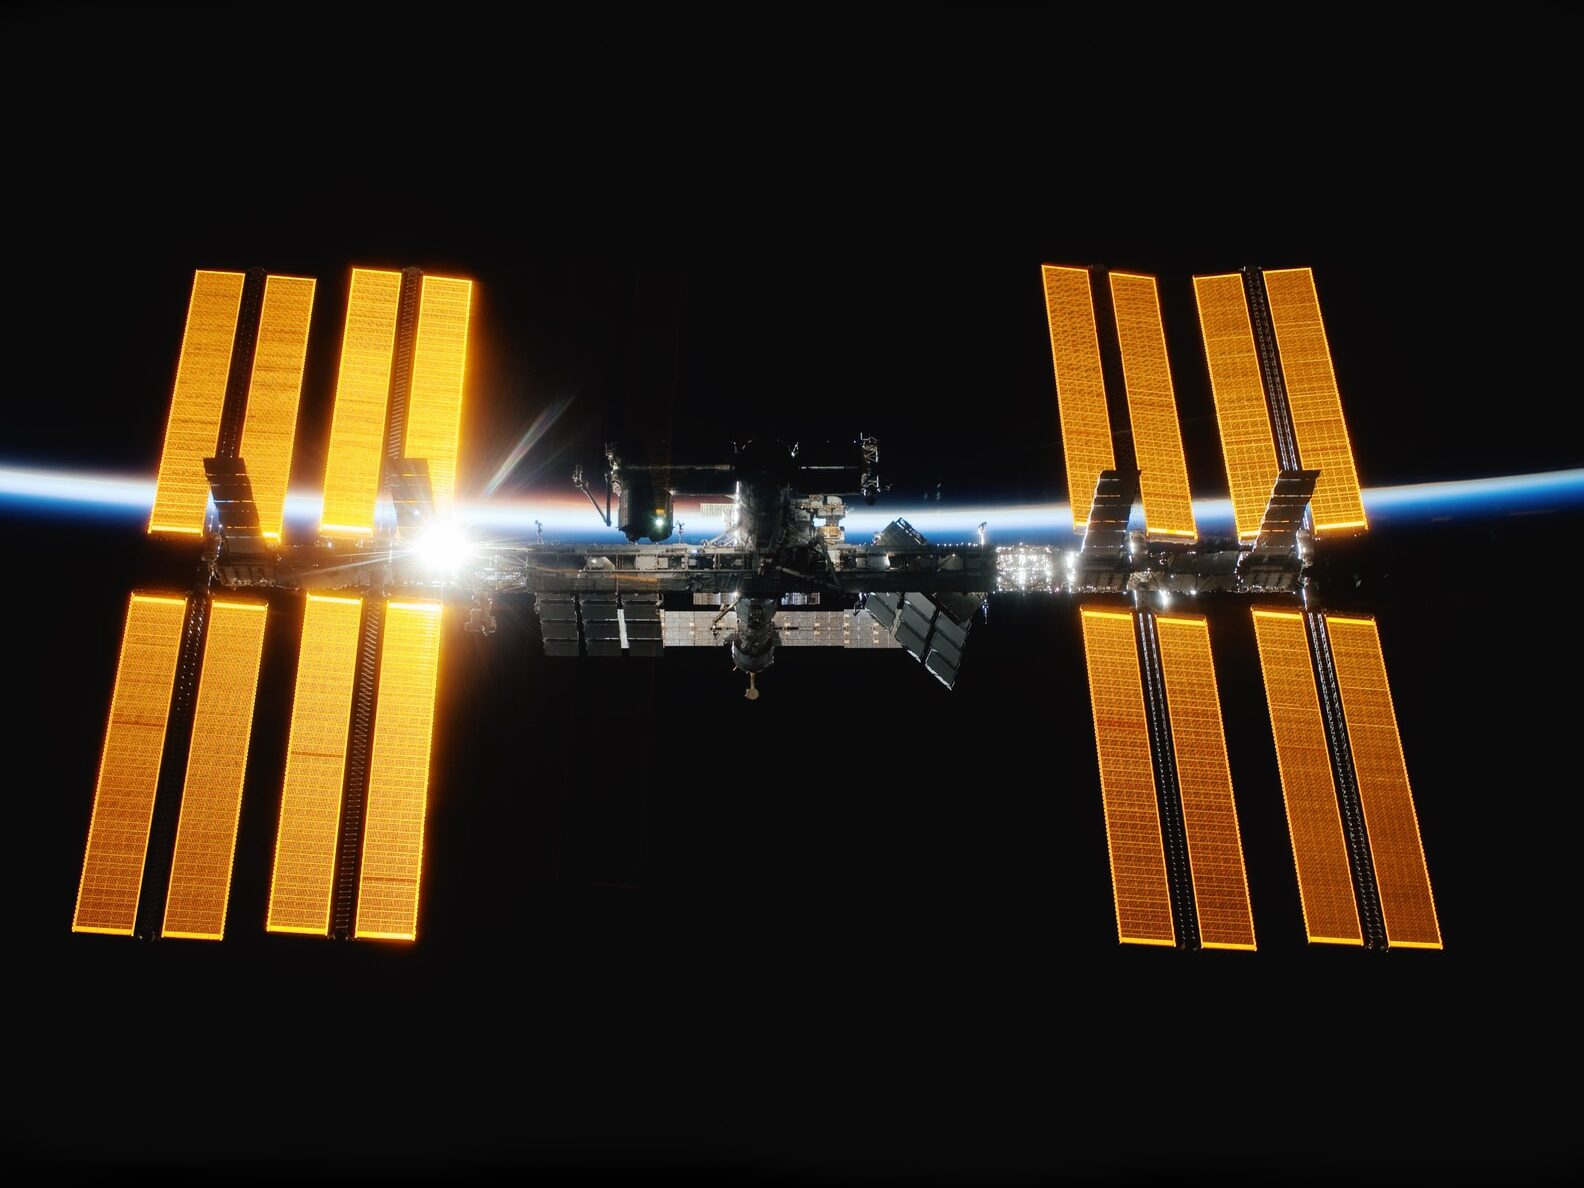 International Space Station orbits earth